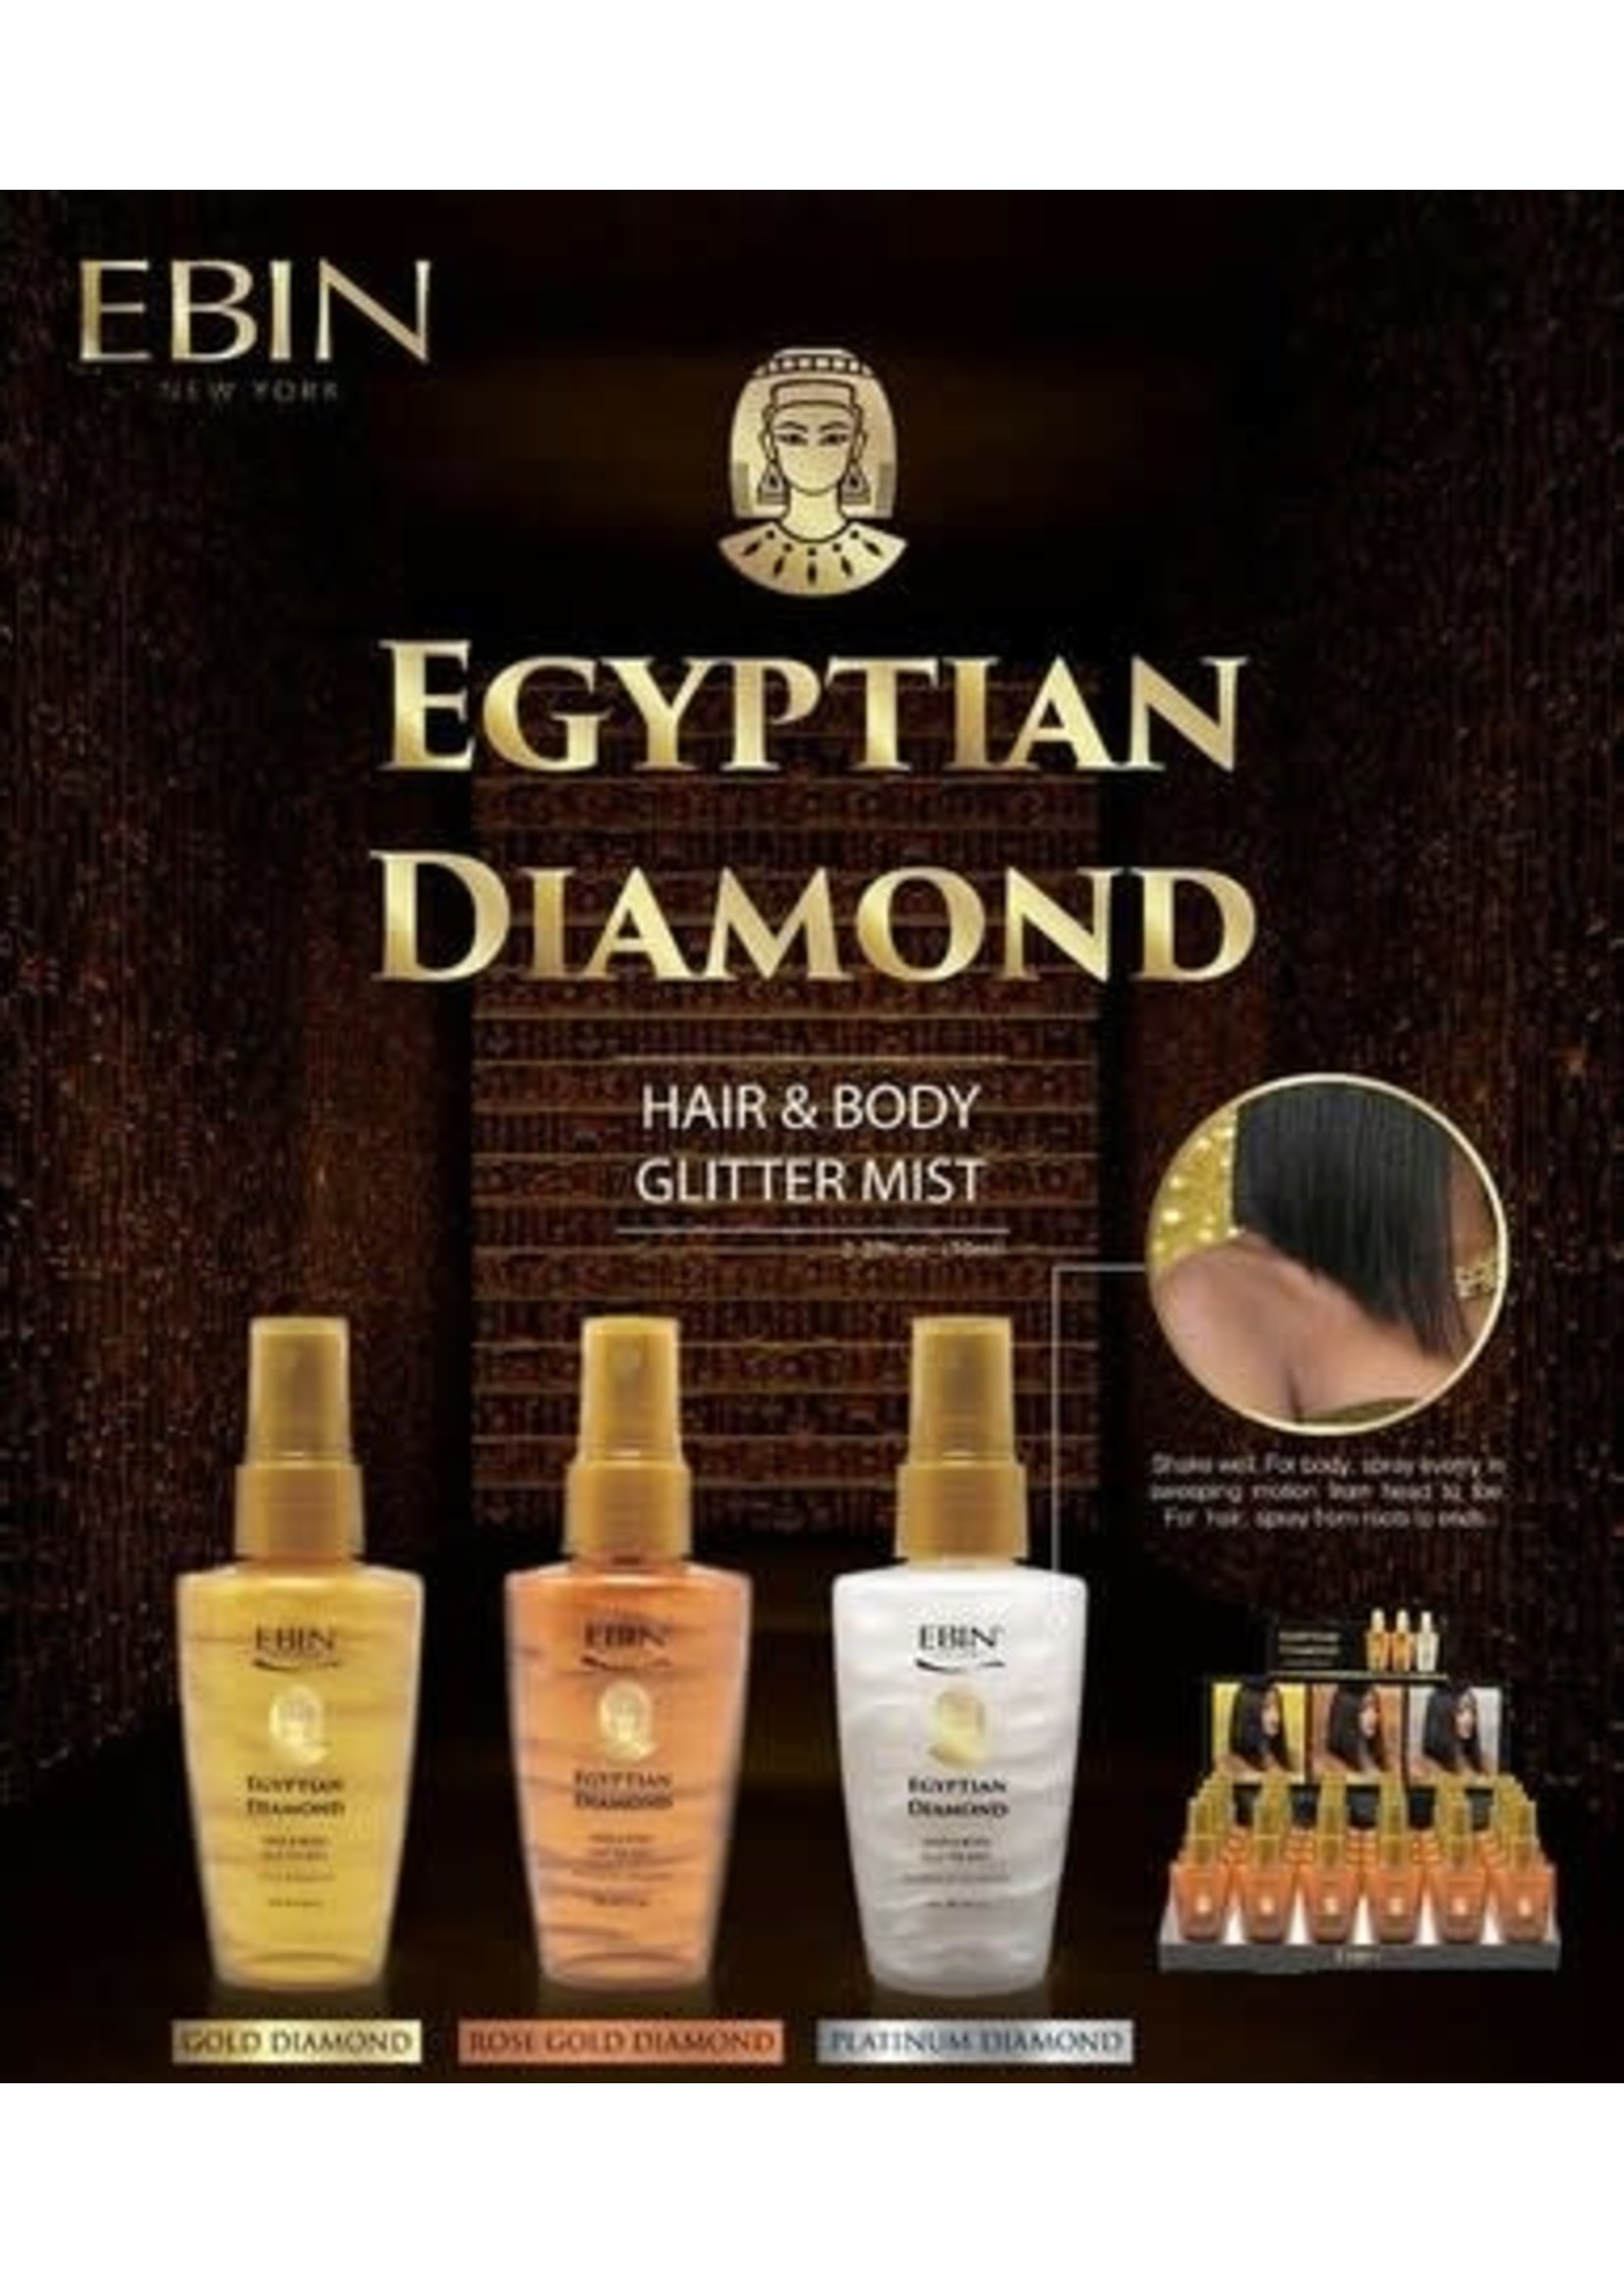 Ebin Egyptian Diamond Hair & Body Glitter Mist